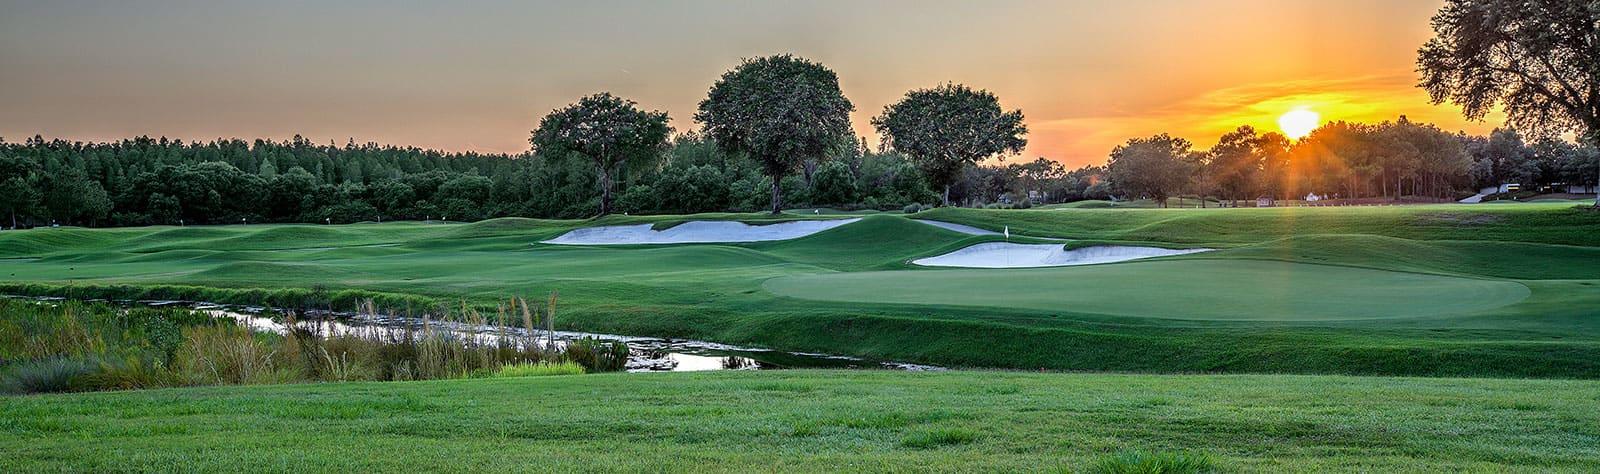 Golf Courses at Florida